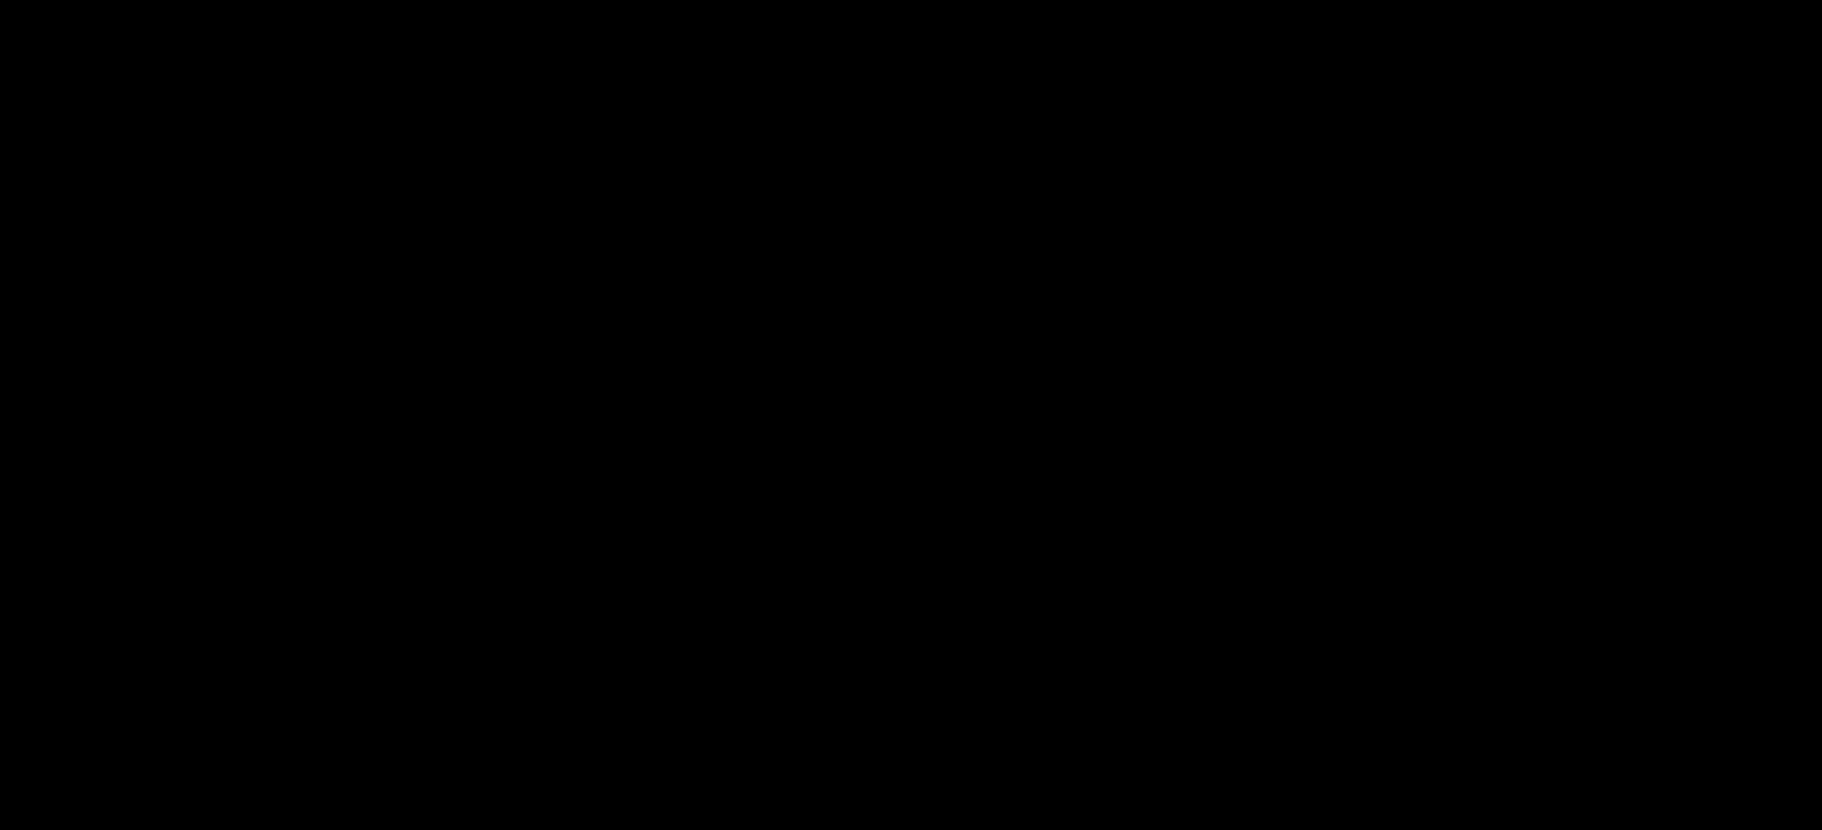 N-(2-(1H-Indol-3-yl)ethyl)-6-iodo-4-oxo-4H-chromene-2-carboxamide